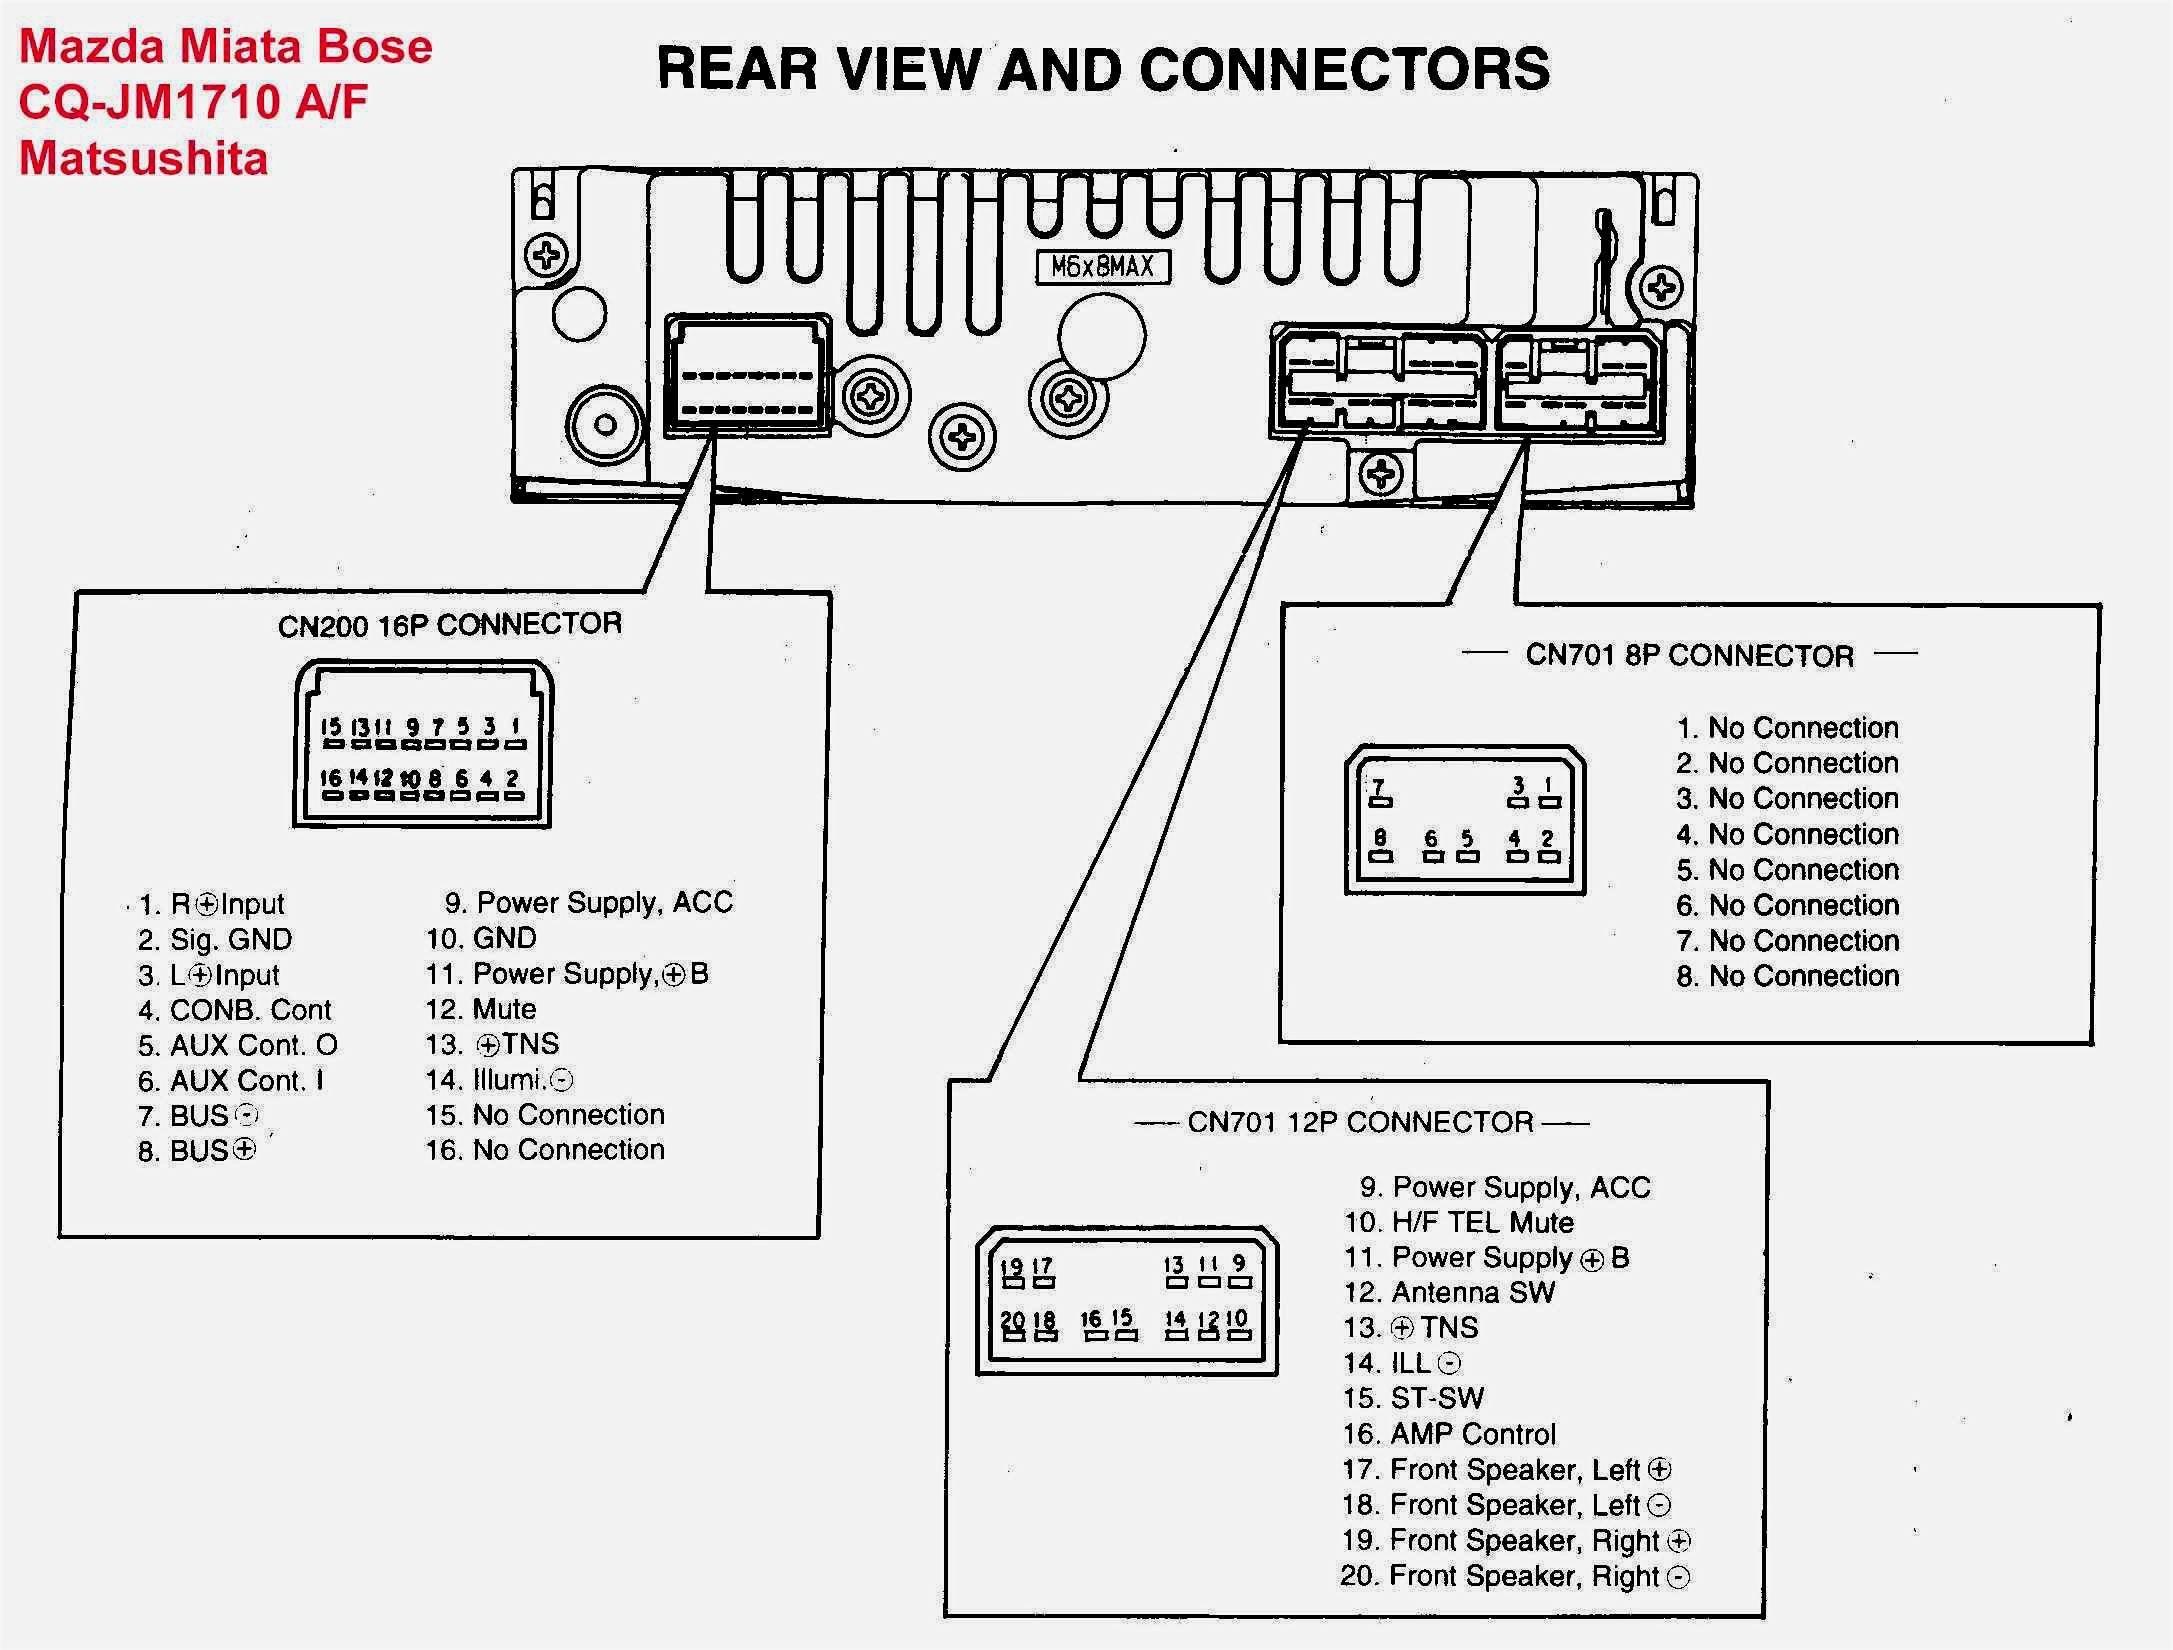 Wiring Diagram For Pioneer Deh X3500Ui | Manual E-Books - Pioneer Deh X3500Ui Wiring Diagram